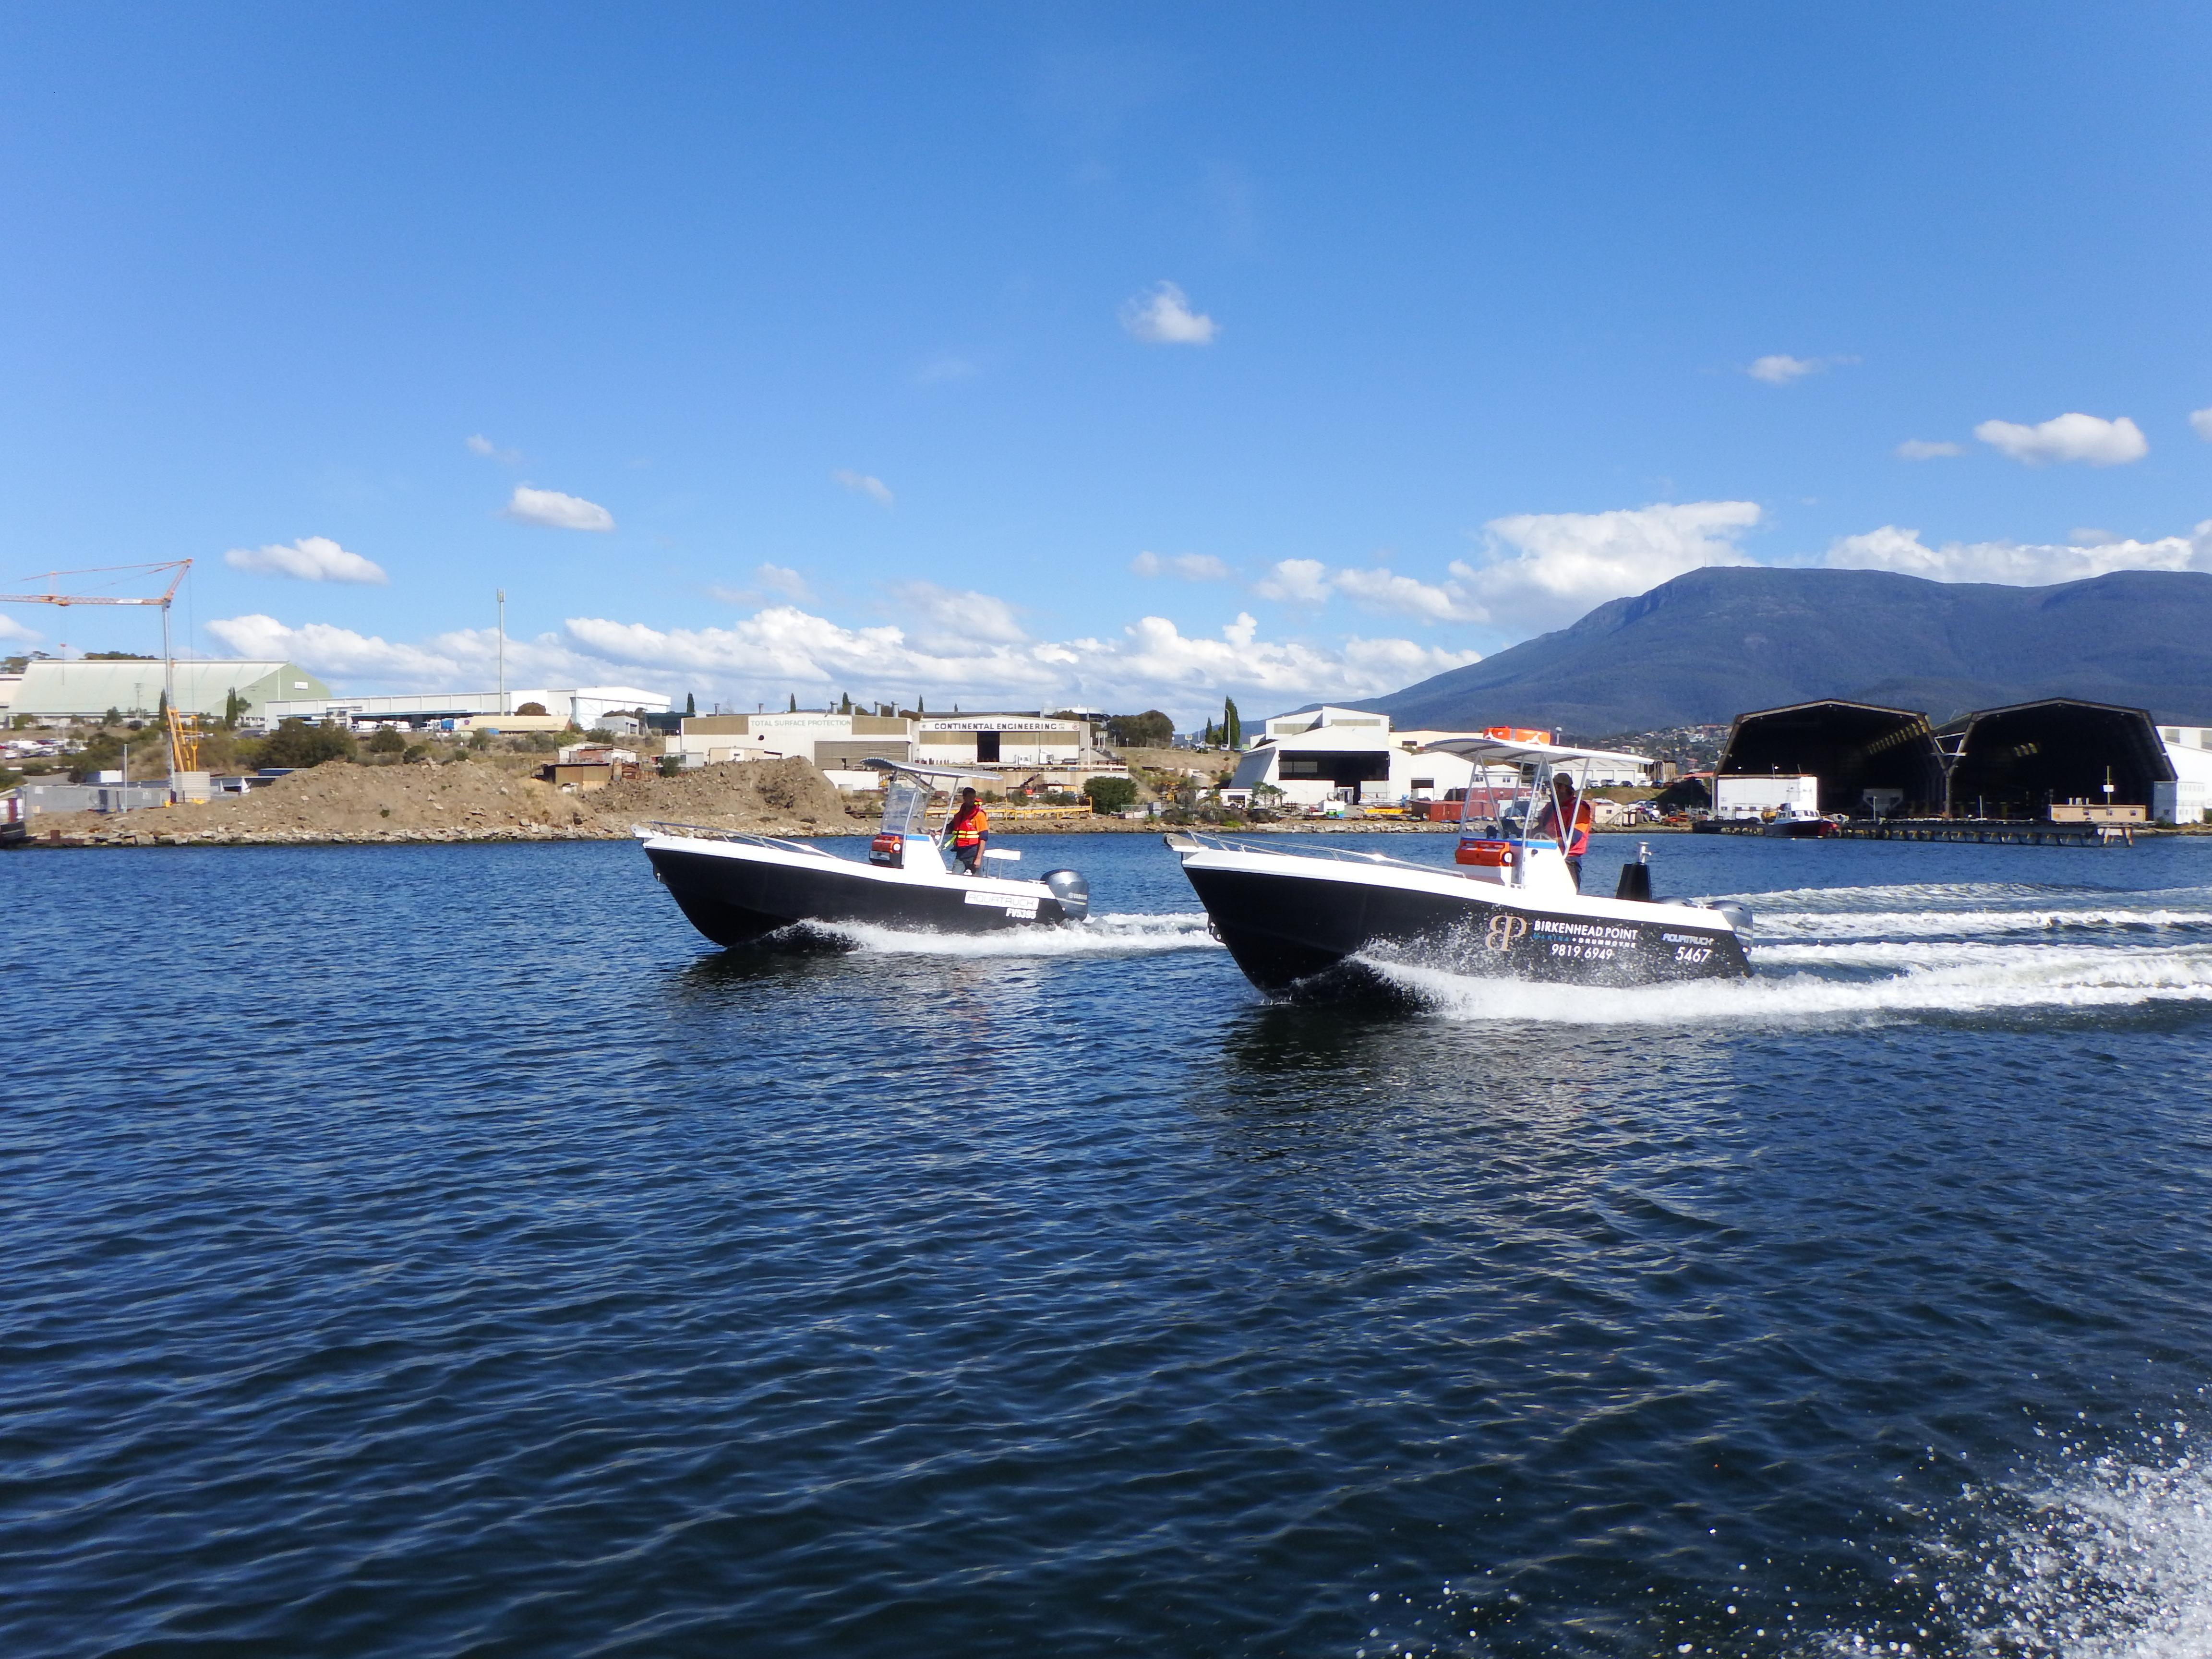 LT_Birkenhead_Point_boat_PLF_AP_01.jpg